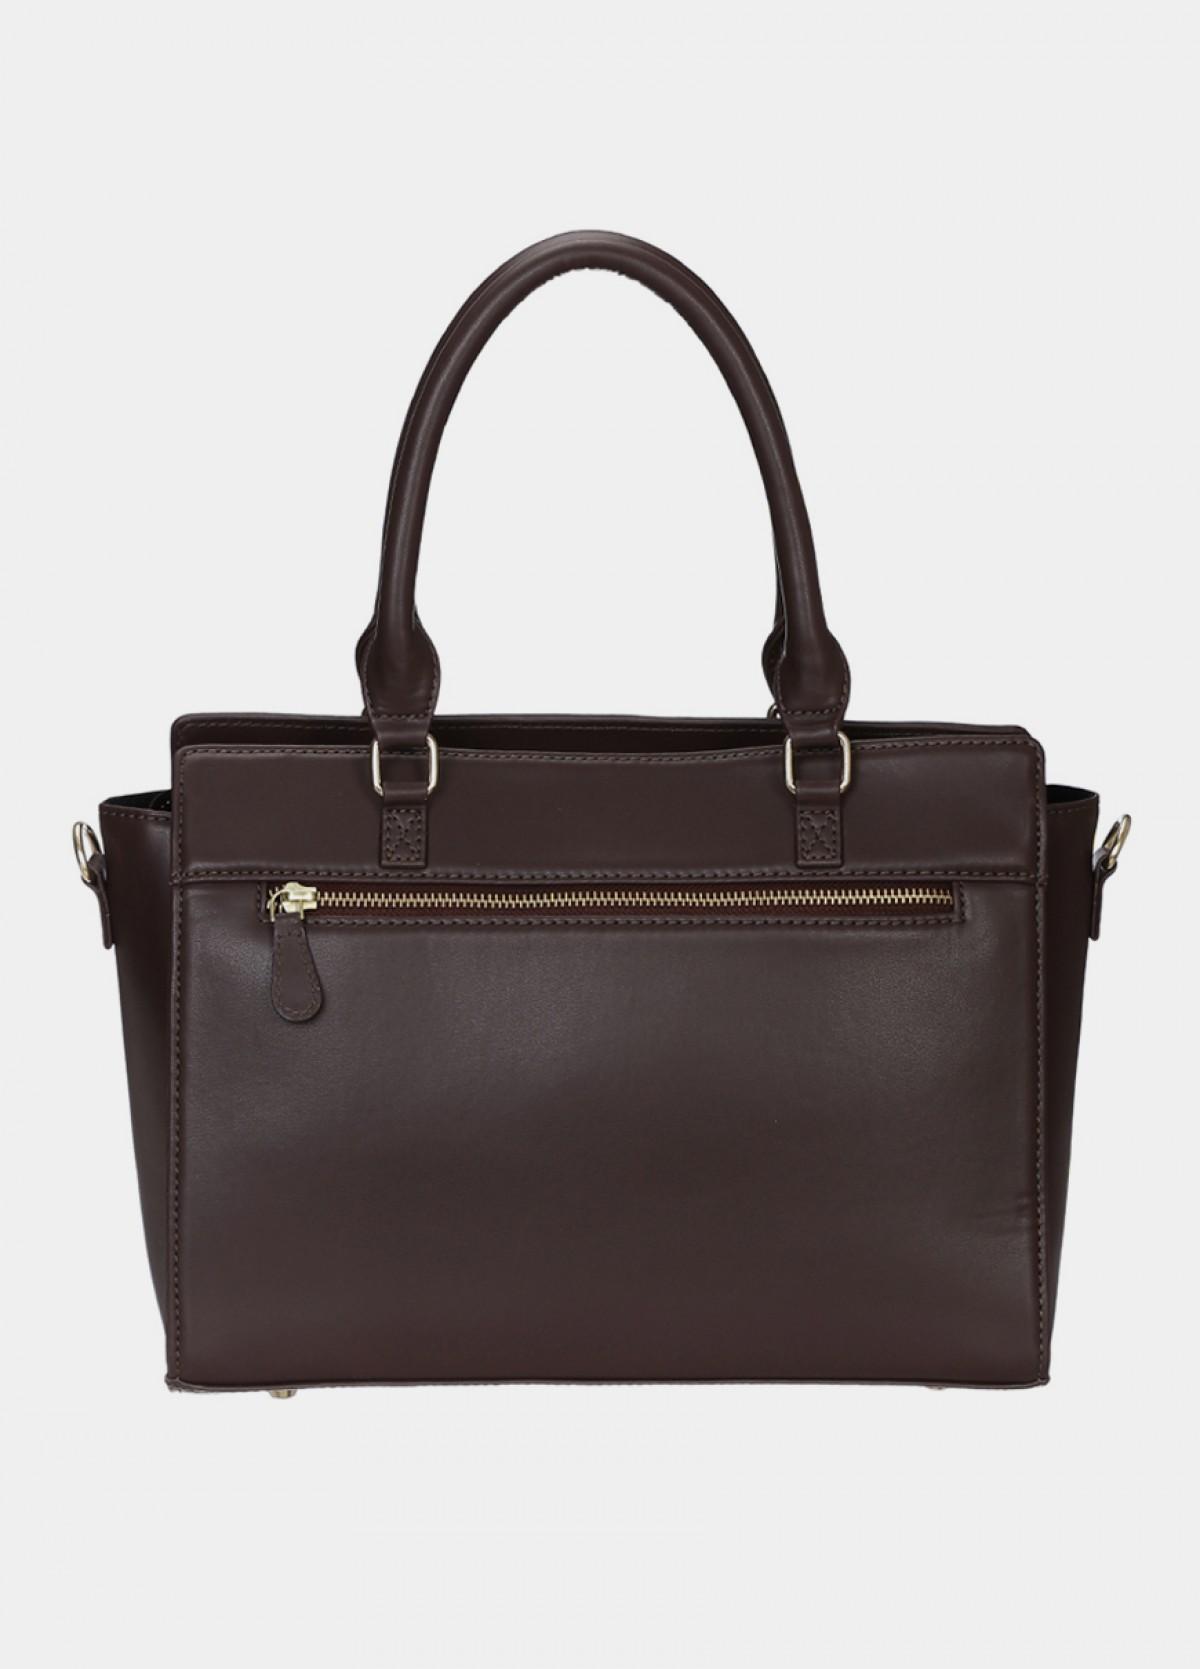 The Brown Printed Shoulder Handbag